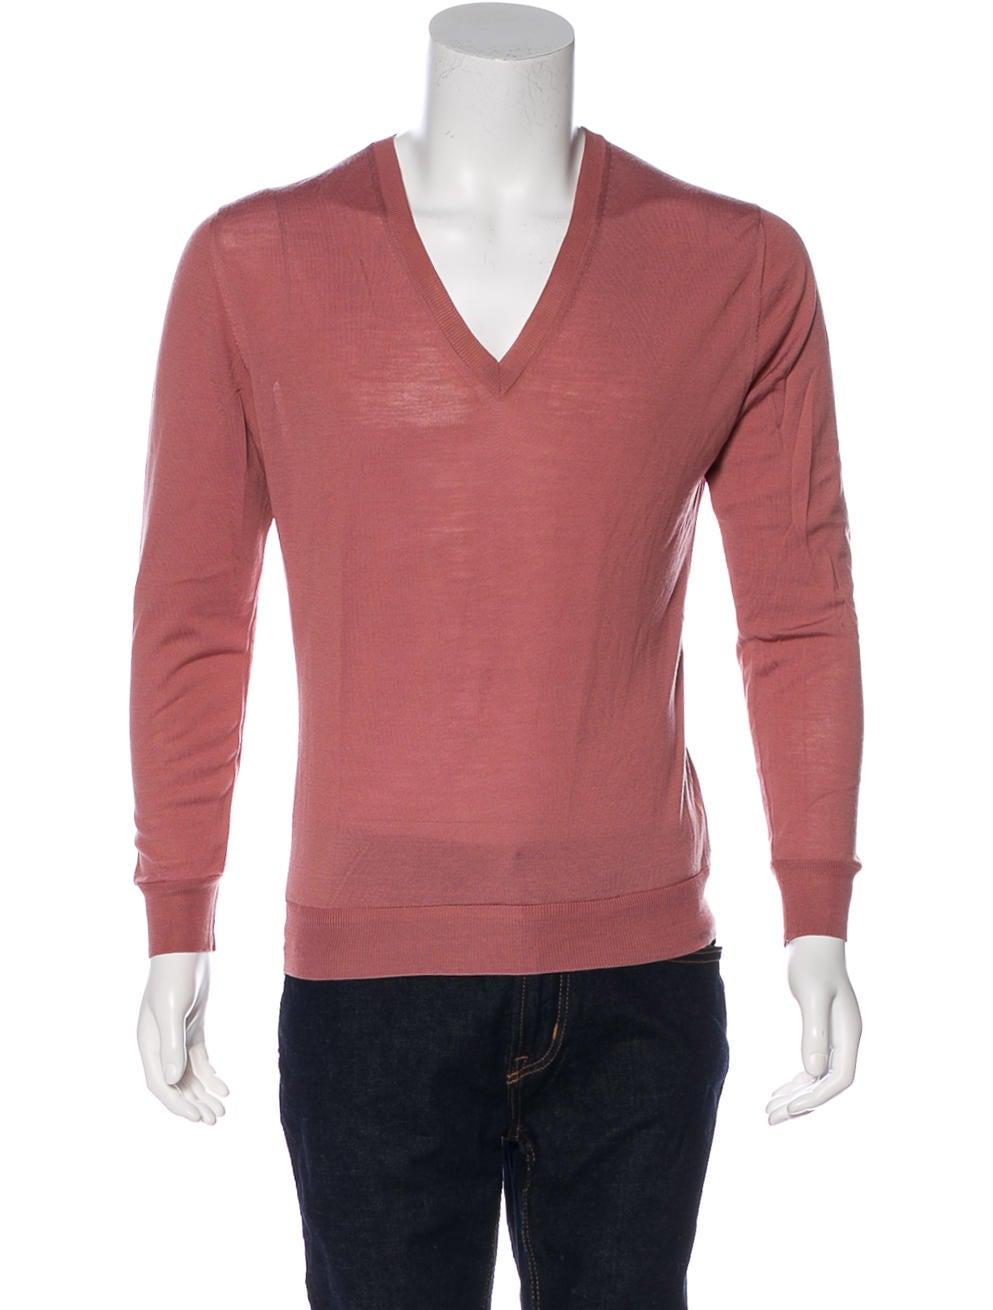 94aa8607f06 Yves Saint Laurent V-Neck Rib Knit Sweater - Clothing - YVE87392 ...